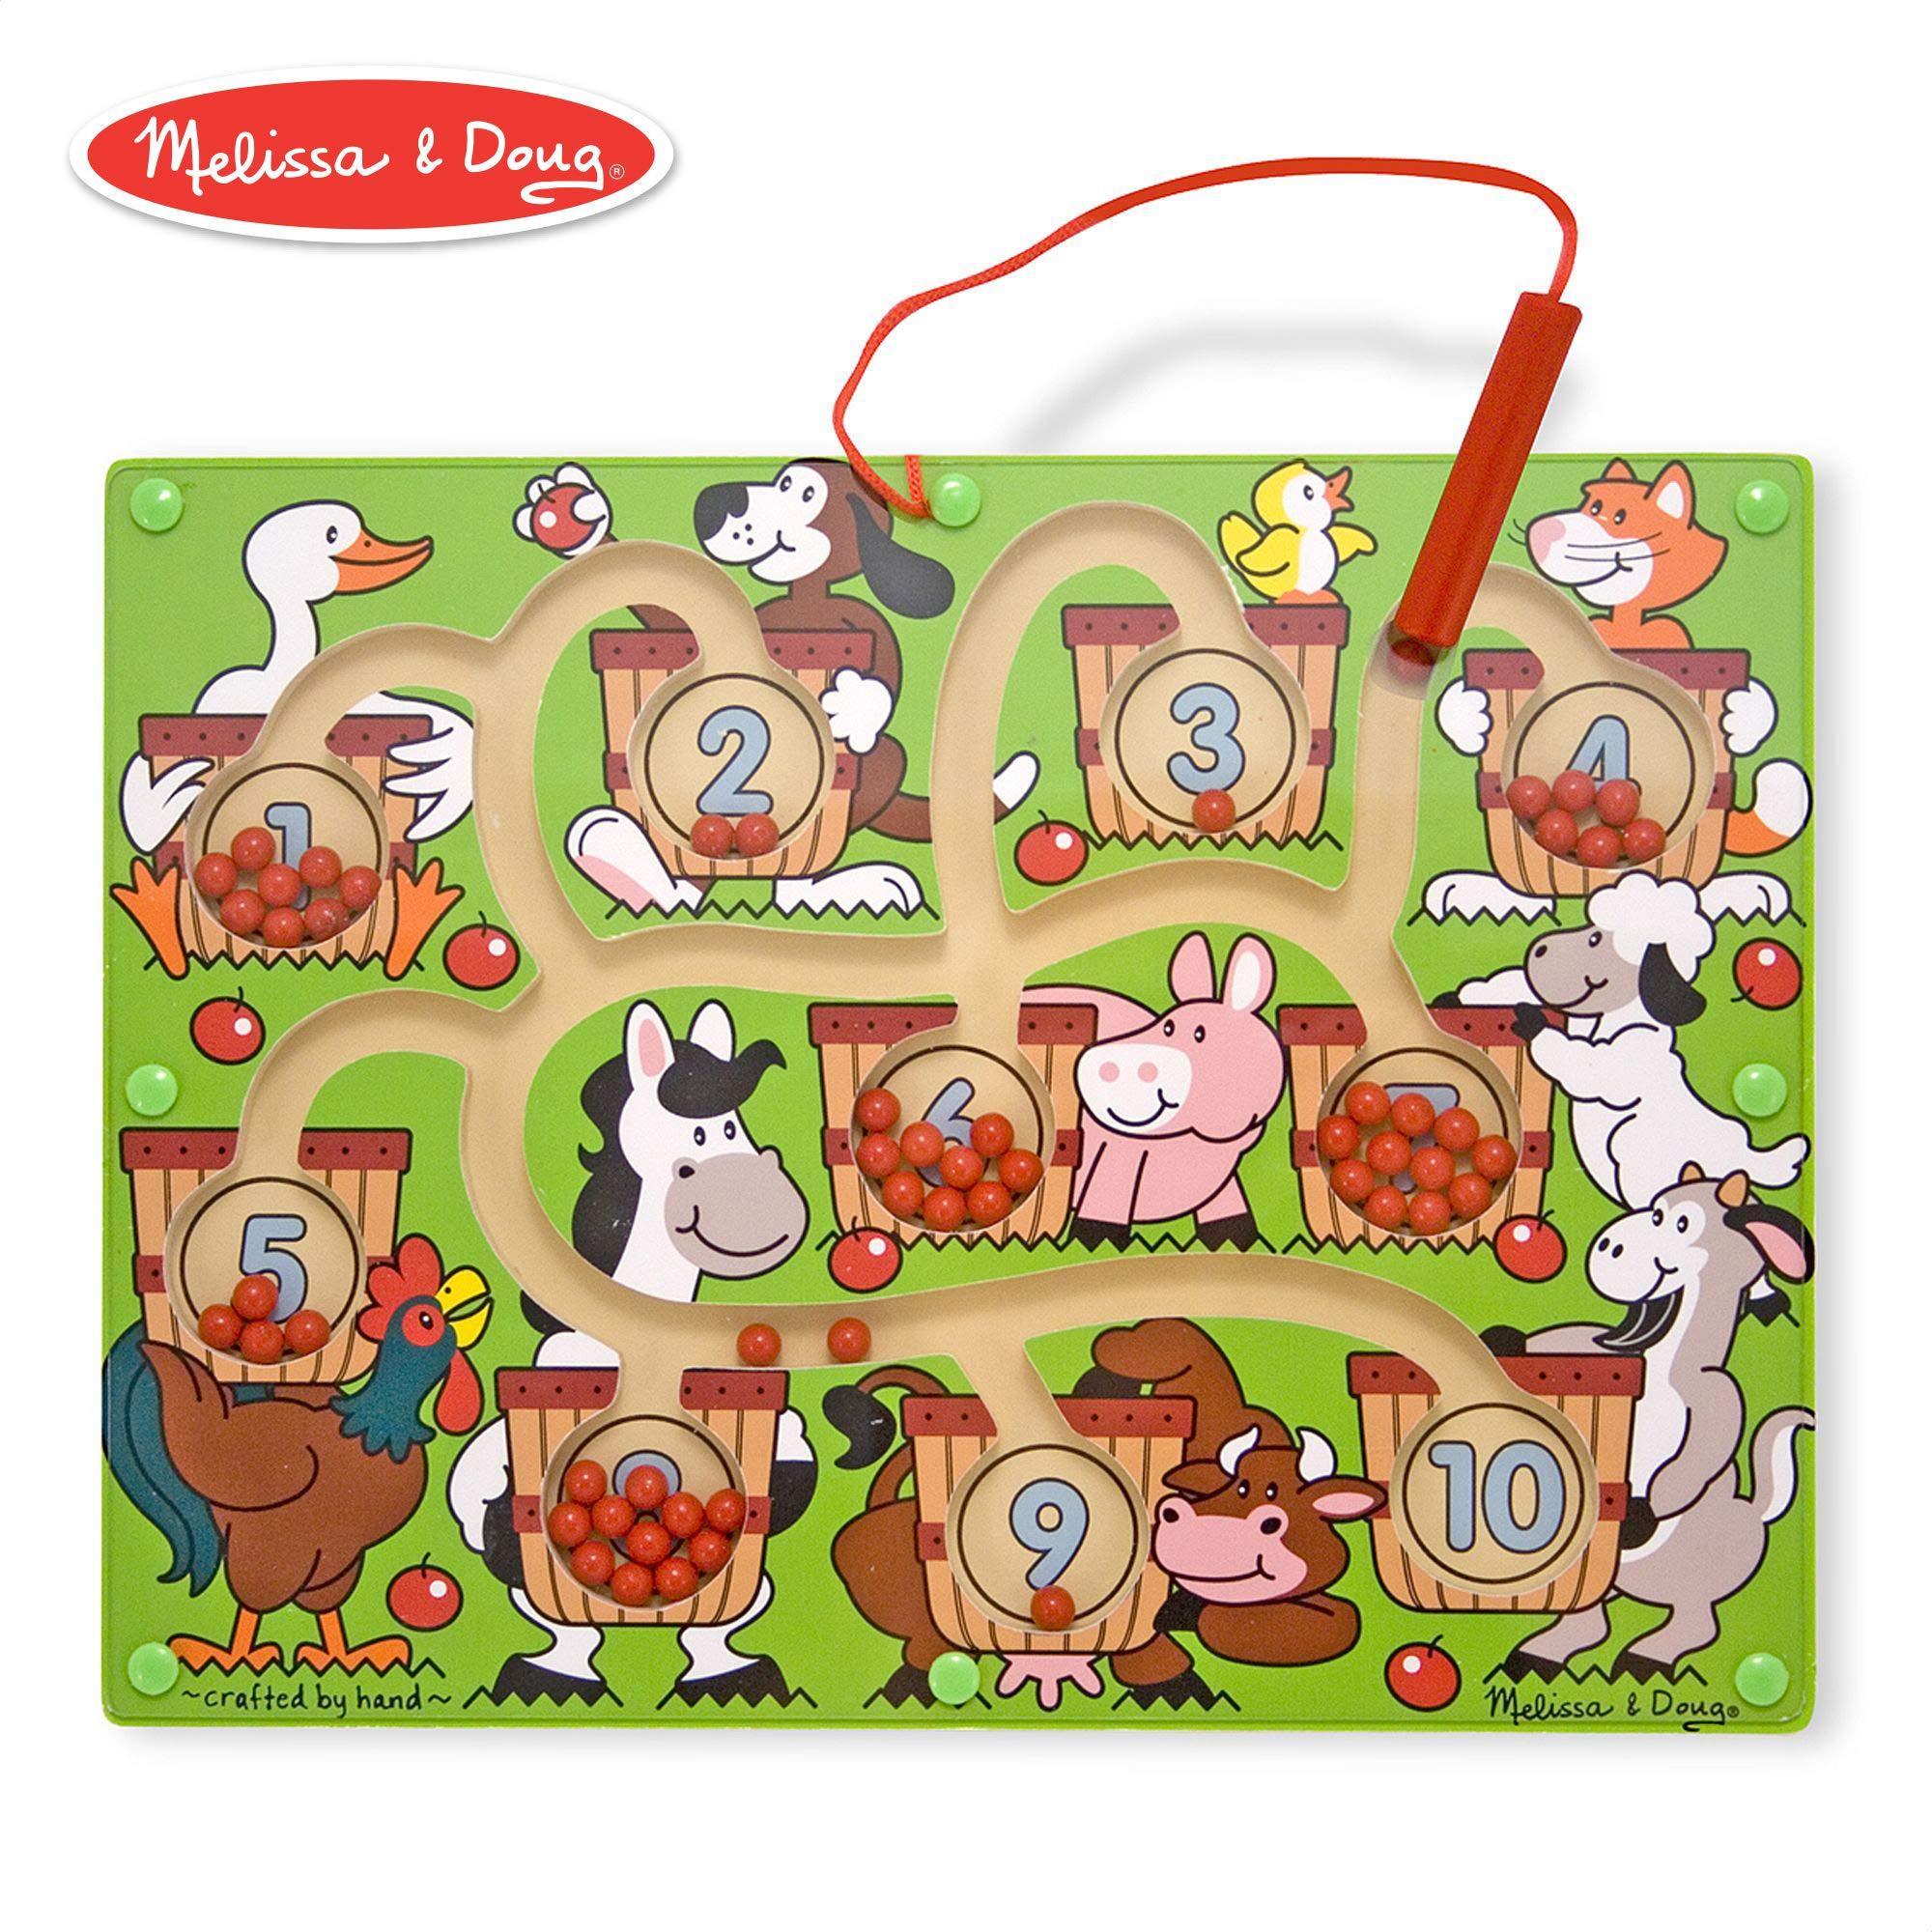 Melissa & Doug Magnetic Wand Number Maze (Developmental Toys, Wooden Activity Board, Develops Multiple Skills) by Melissa & Doug